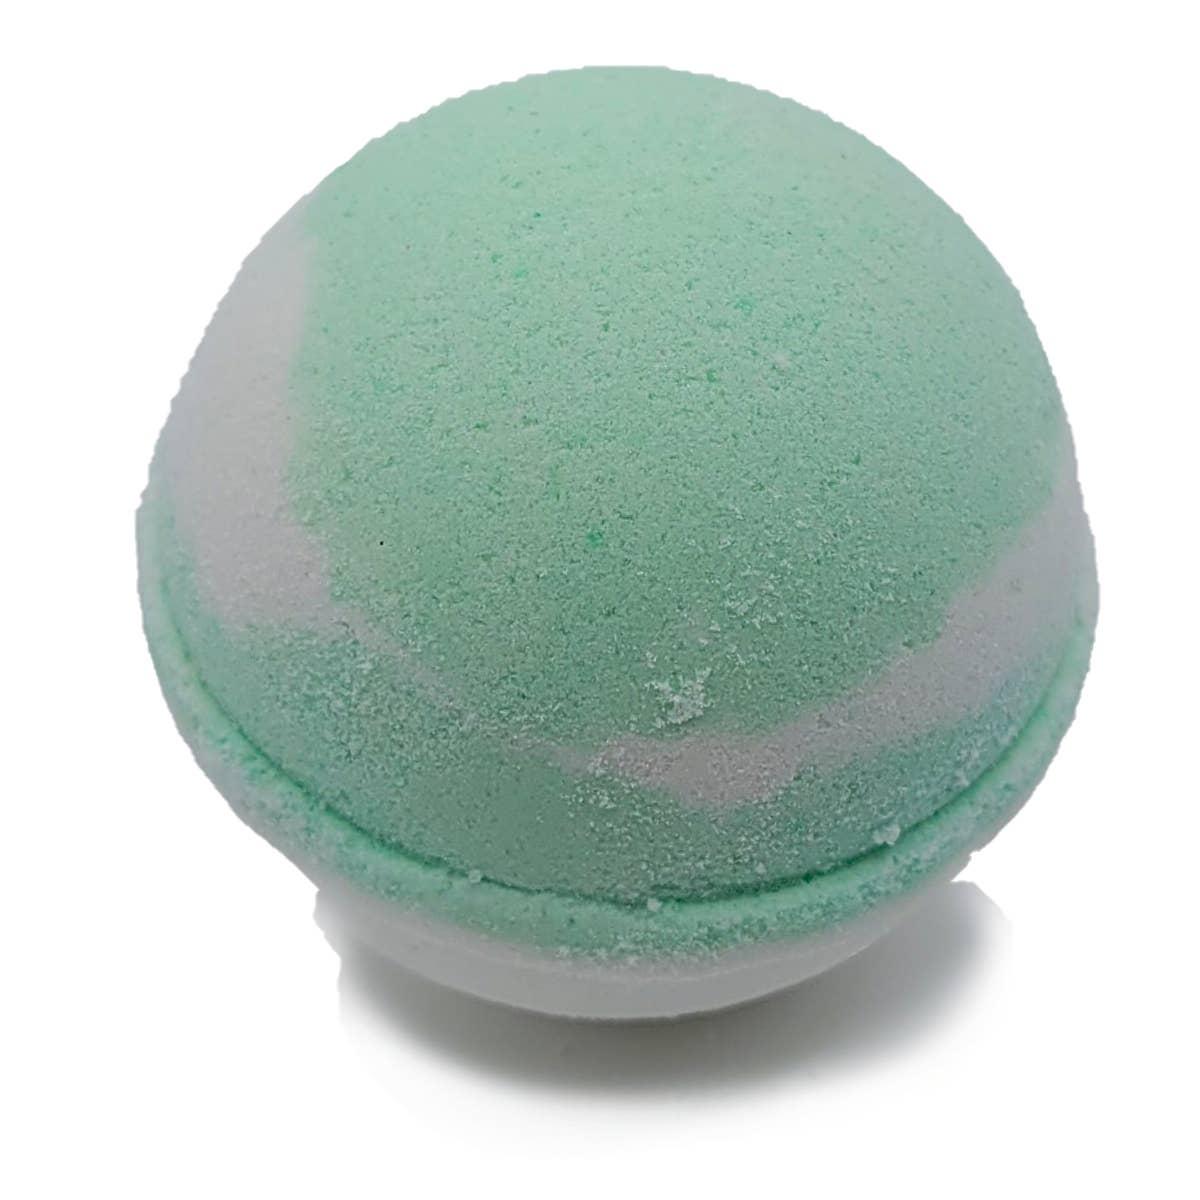 Evolve - Bath Bomb - Coconut Lime Verbena | Trada Marketplace